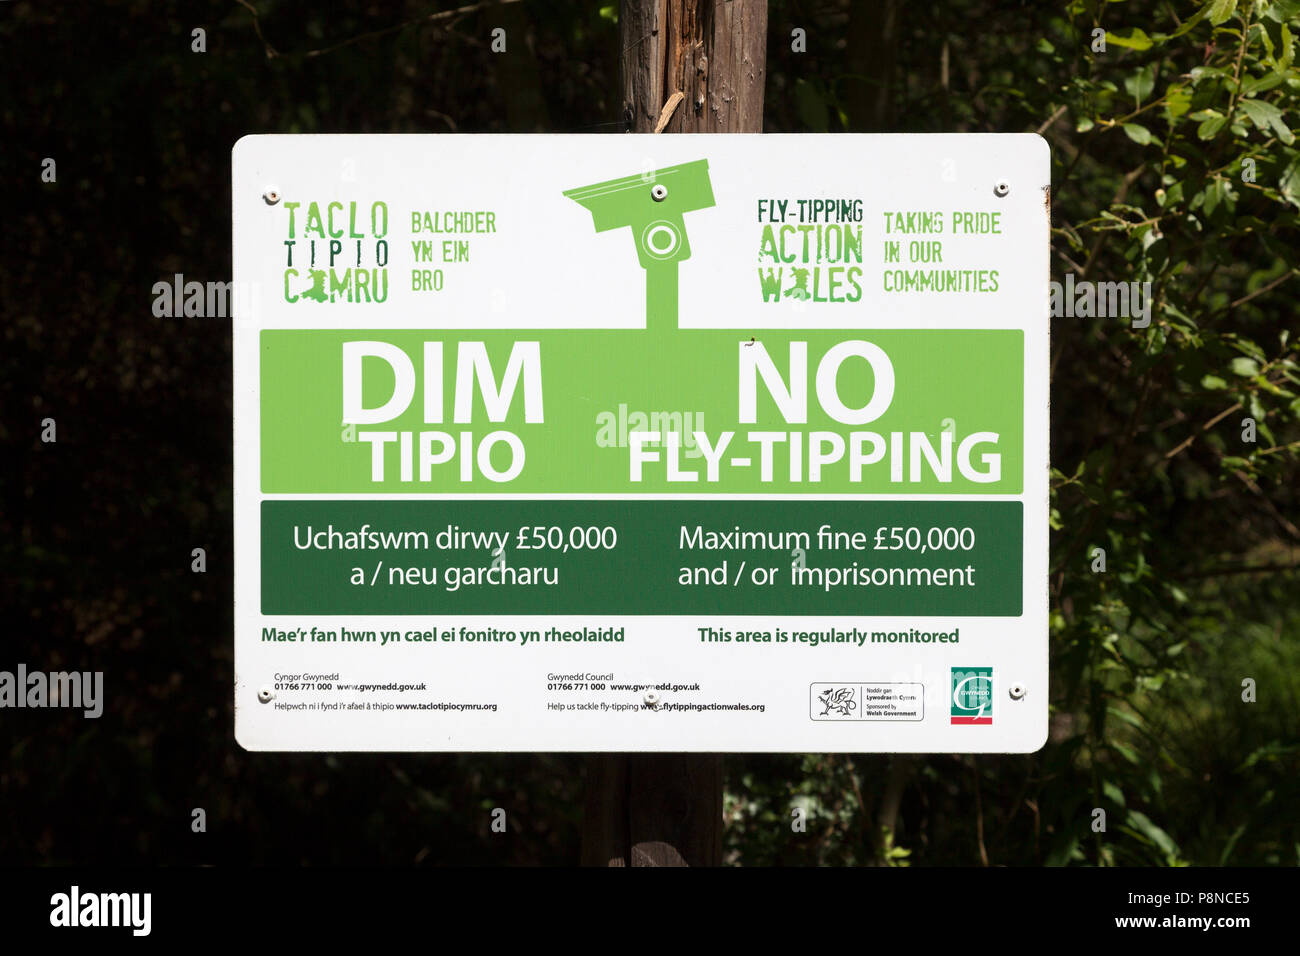 'No Fly-Tipping' warning in Welsh and English, Rhyd, Gwynedd, Wales - Stock Image